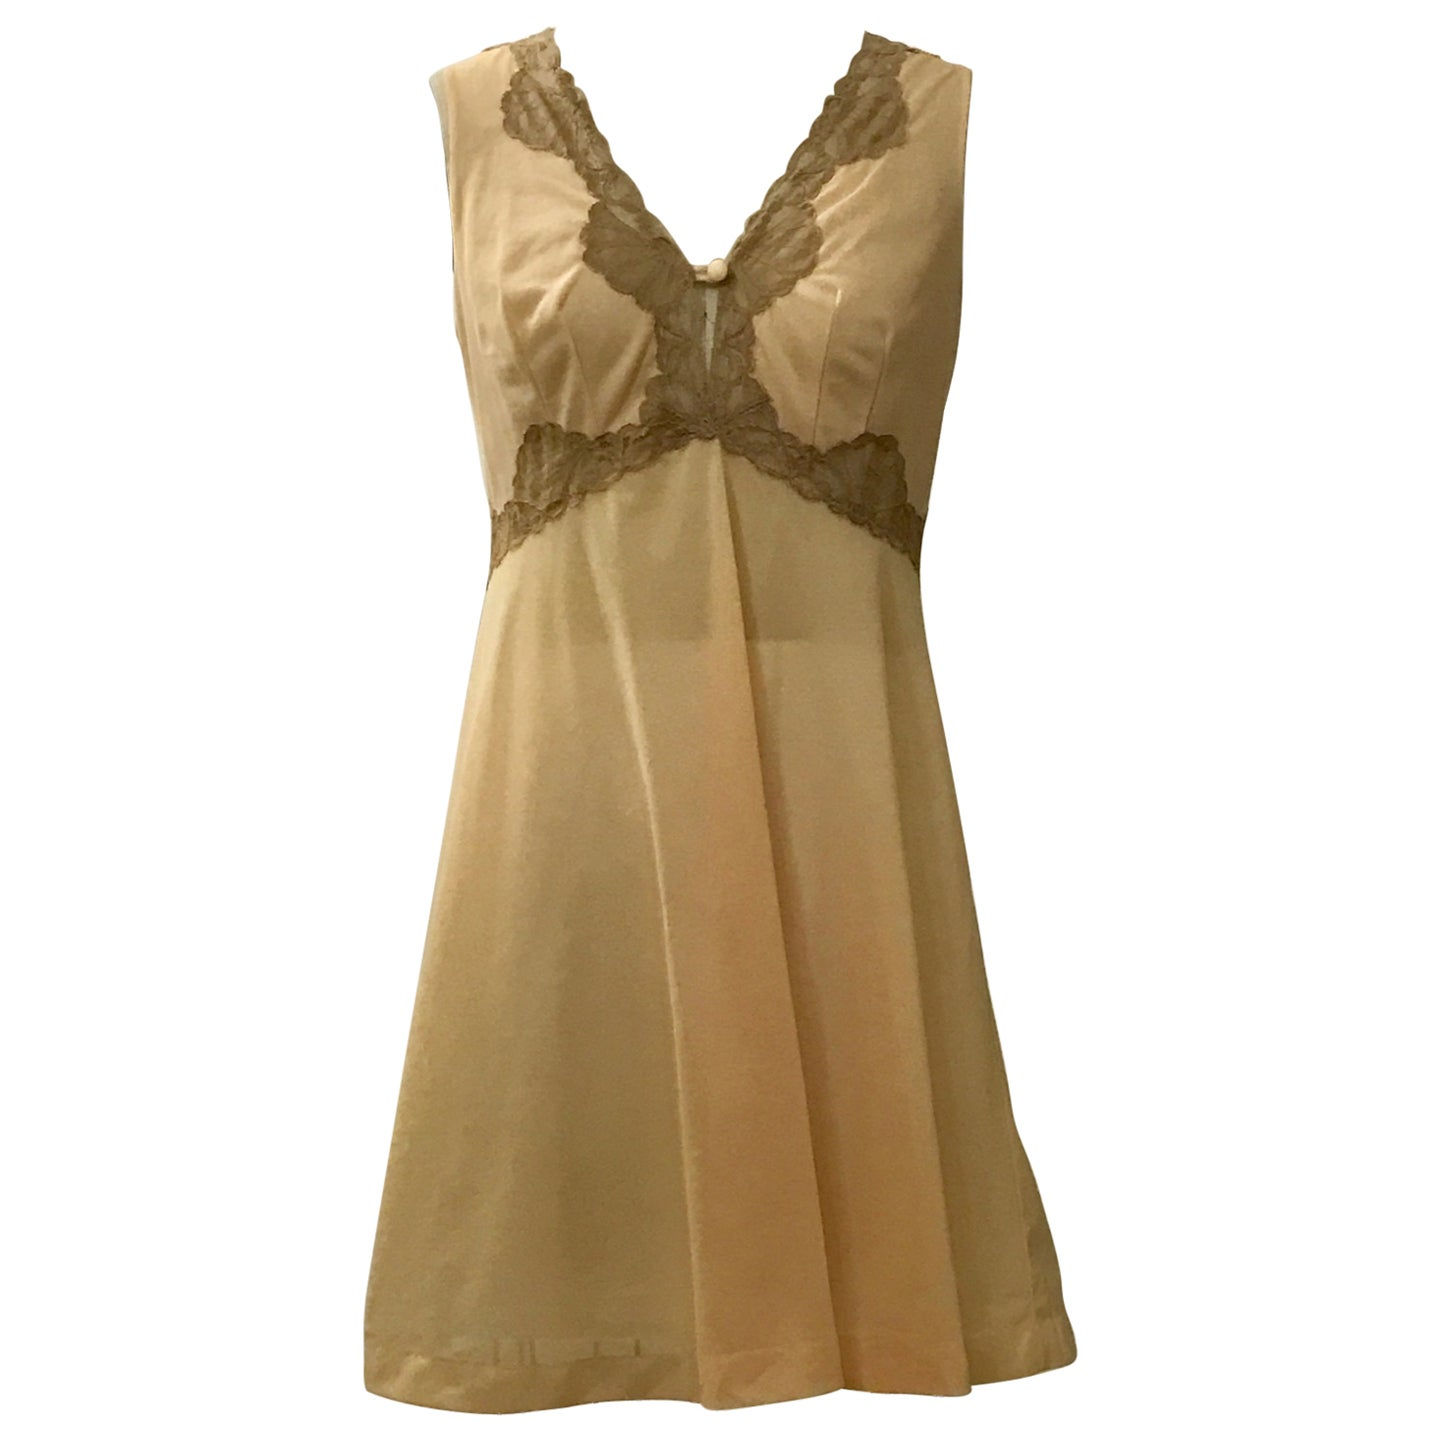 Emilio Pucci for Formfit Rogers Vintage Peach Beige Chemise Slip Nightgown, 1960